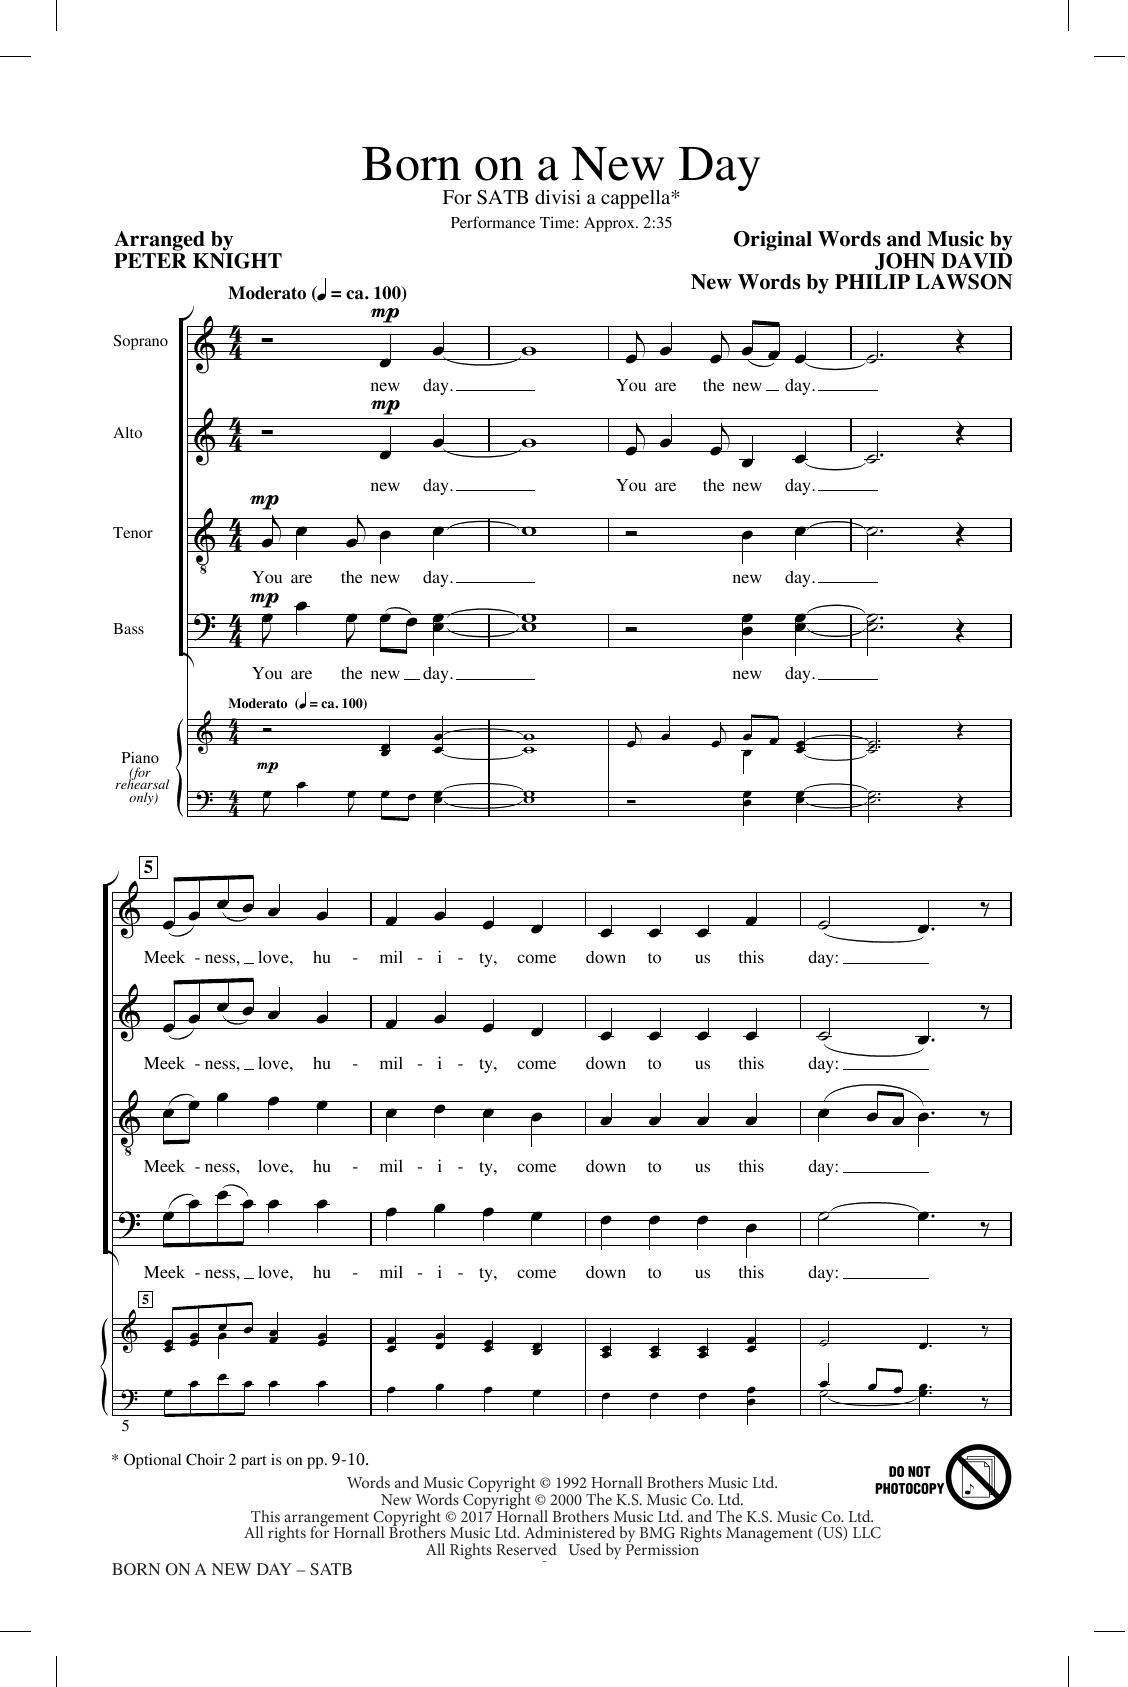 Born On A New Day (arr. Peter Knight) (SATB Choir)